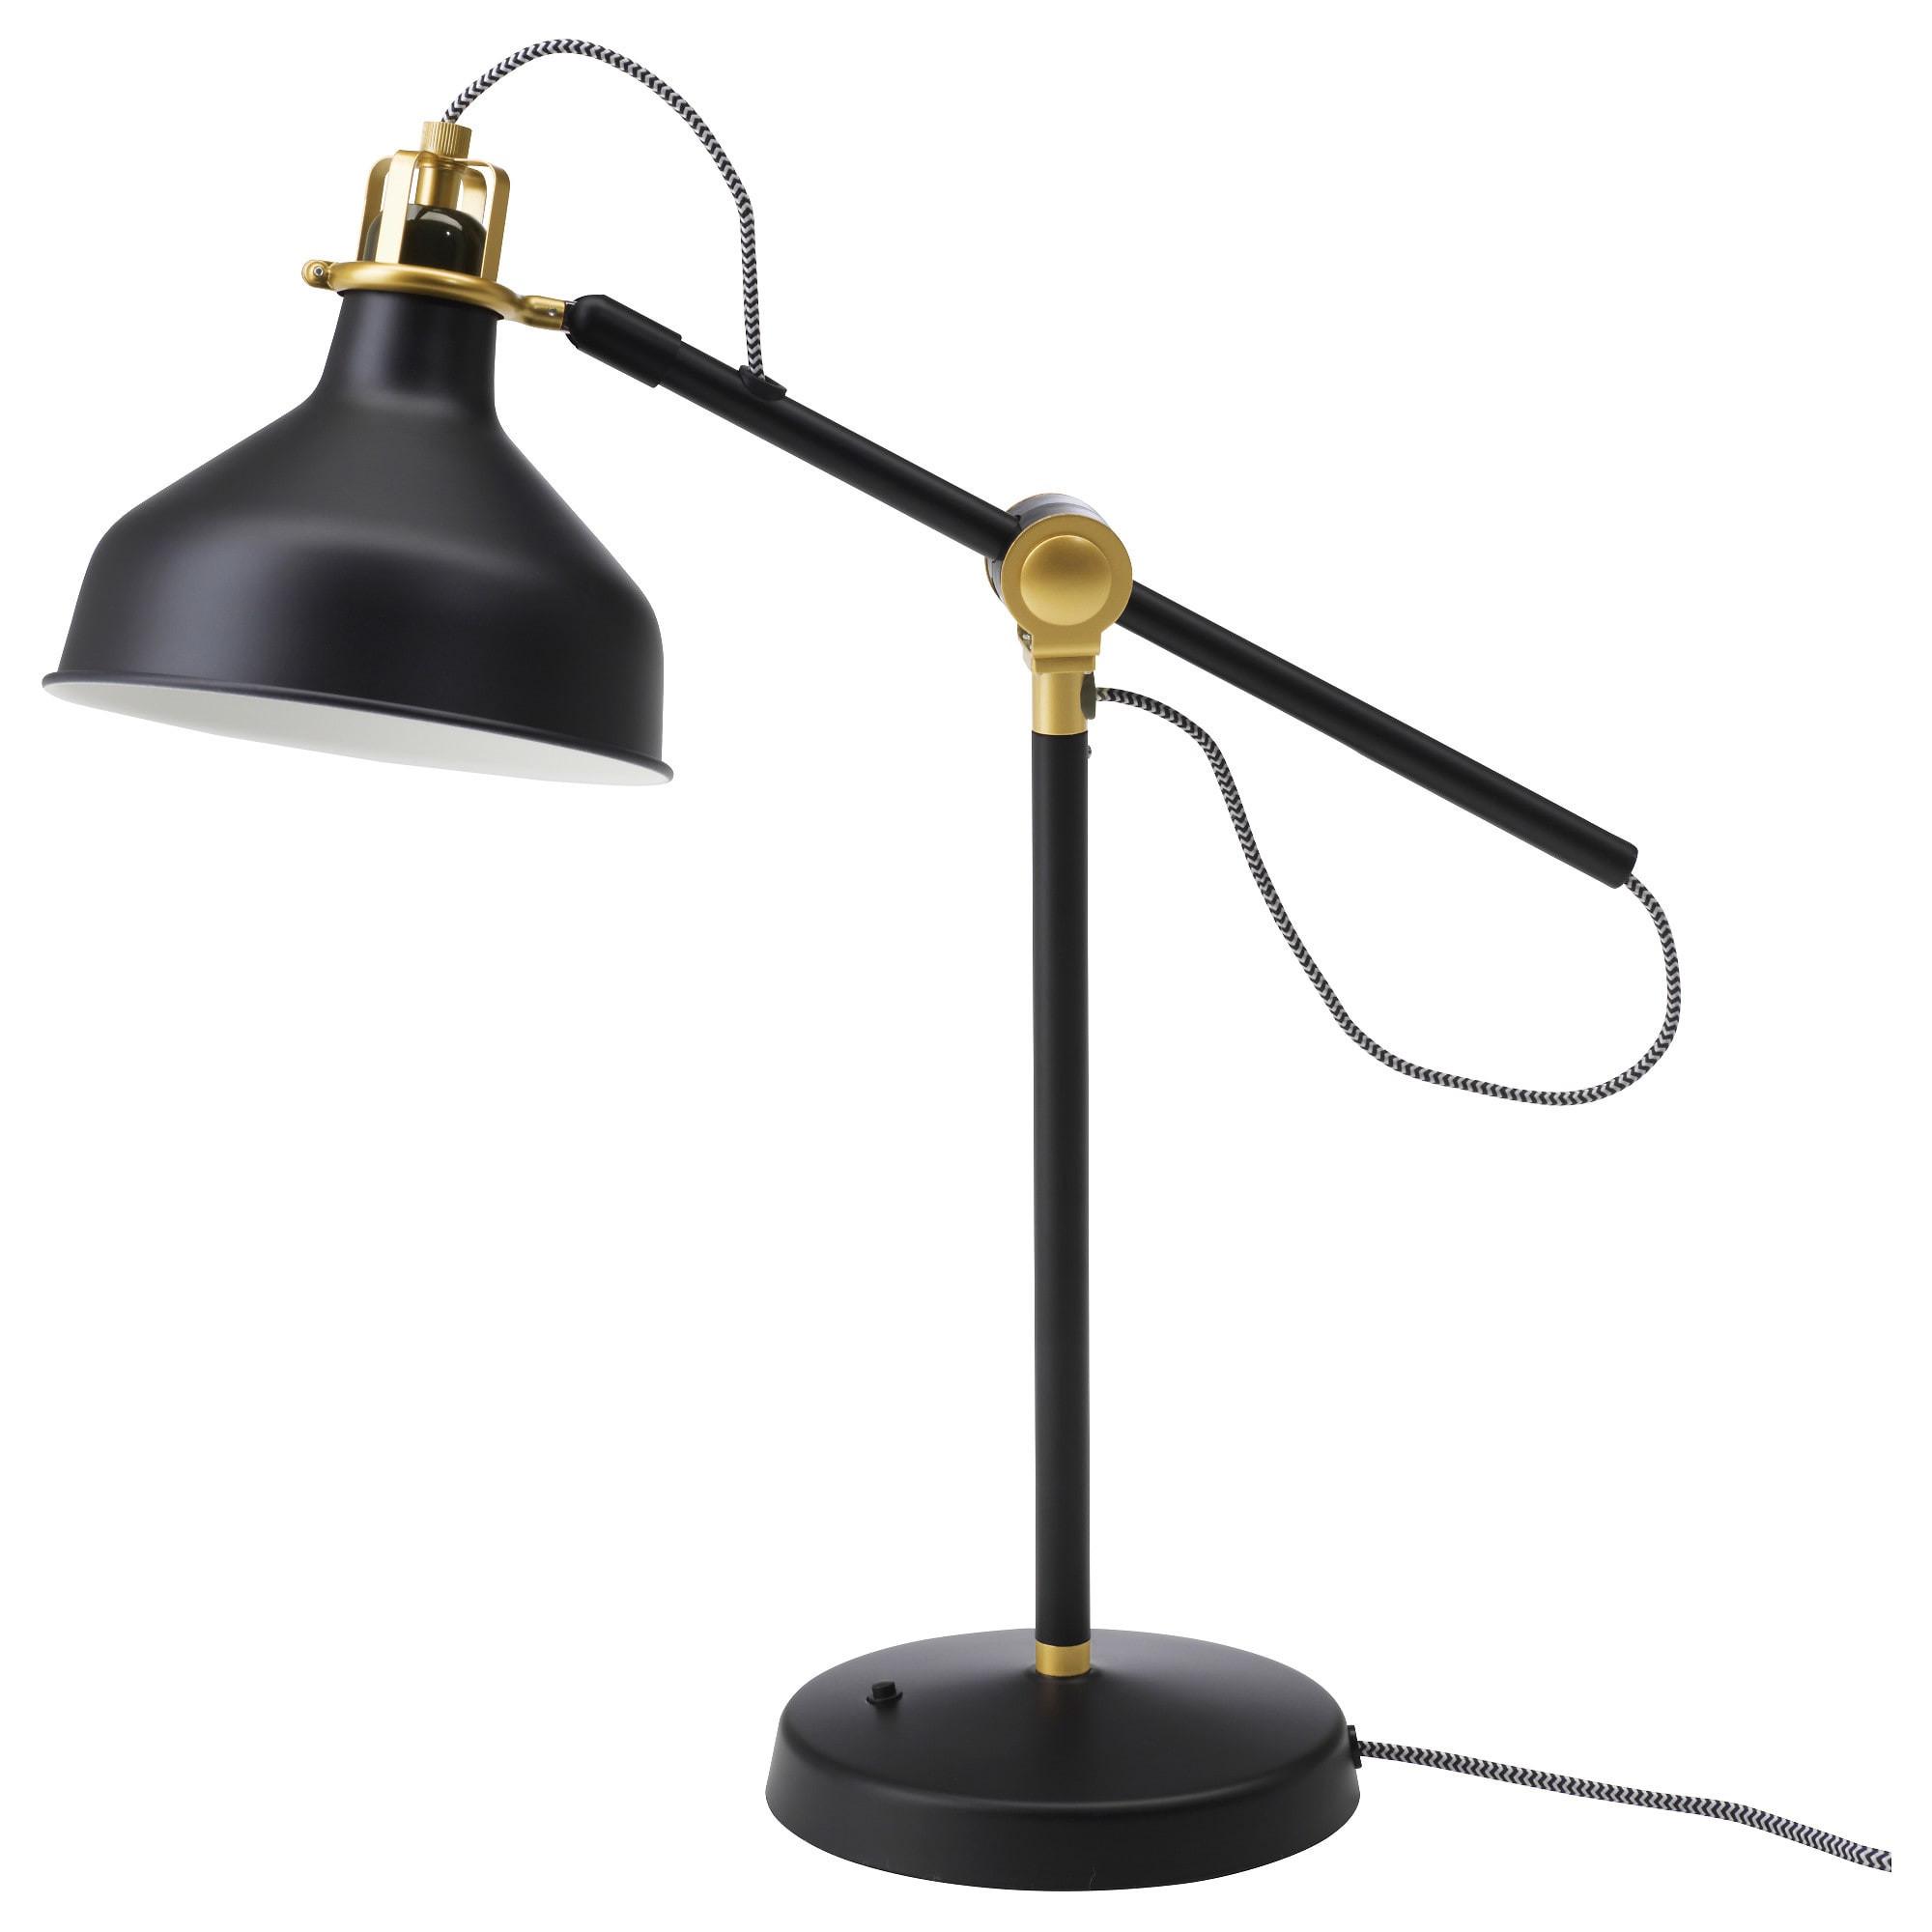 Best ideas about Desk Lamp Ikea . Save or Pin RANARP Work lamp Black IKEA Now.